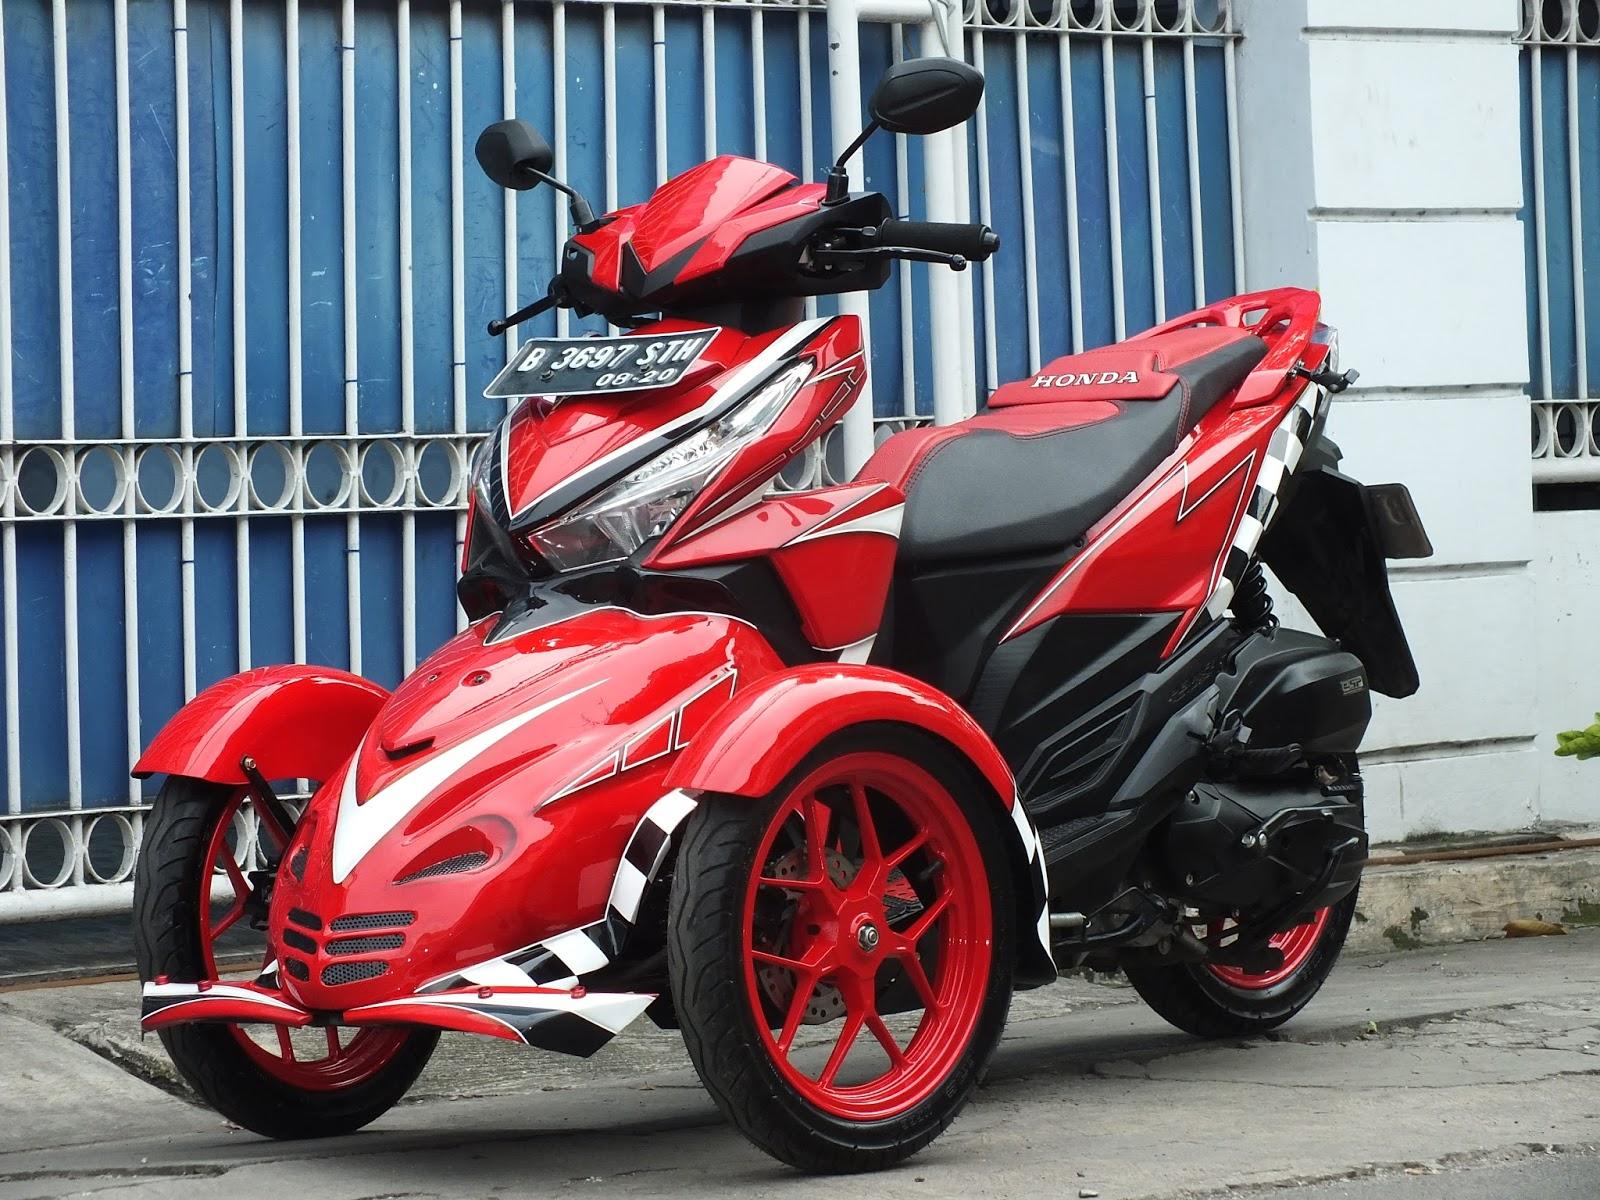 Modifikasi JOK MOTOR JOK Honda Vario 150 Modif Model SPORTY Pesanan